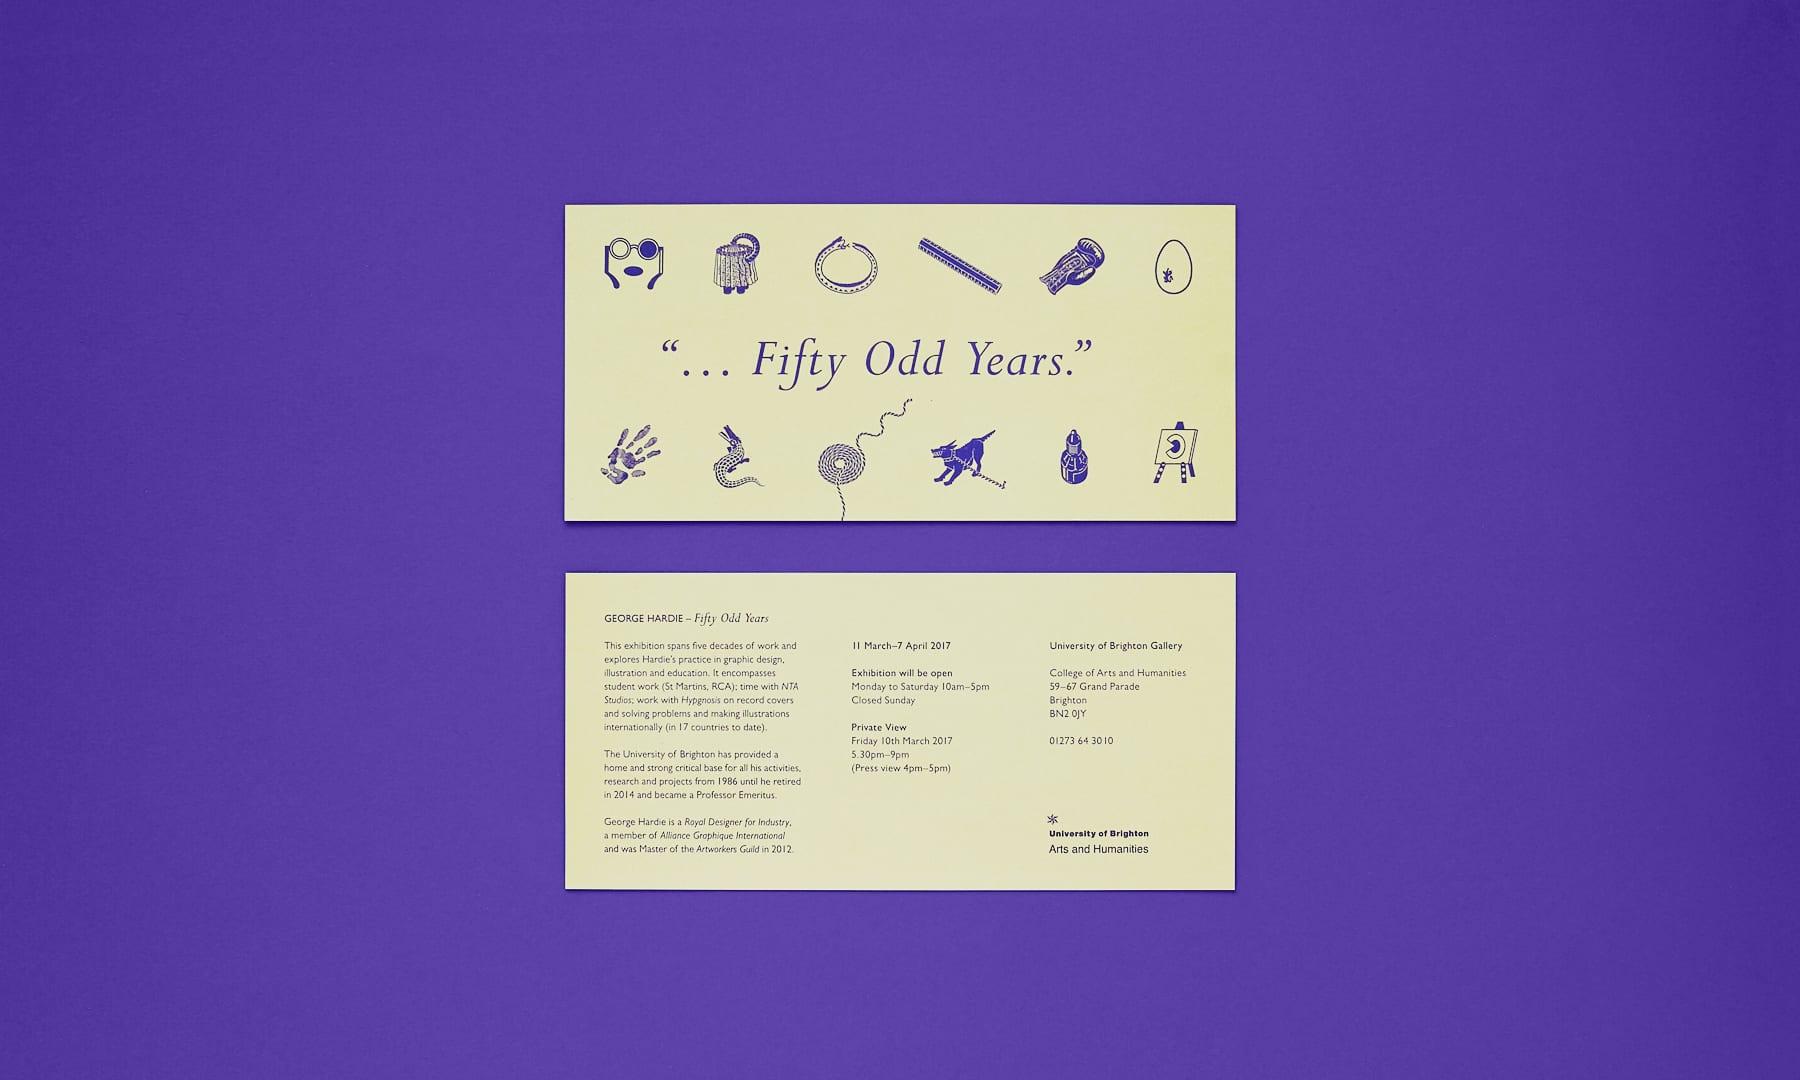 Fifty Odd Years - George Hardie - printed invitation 1